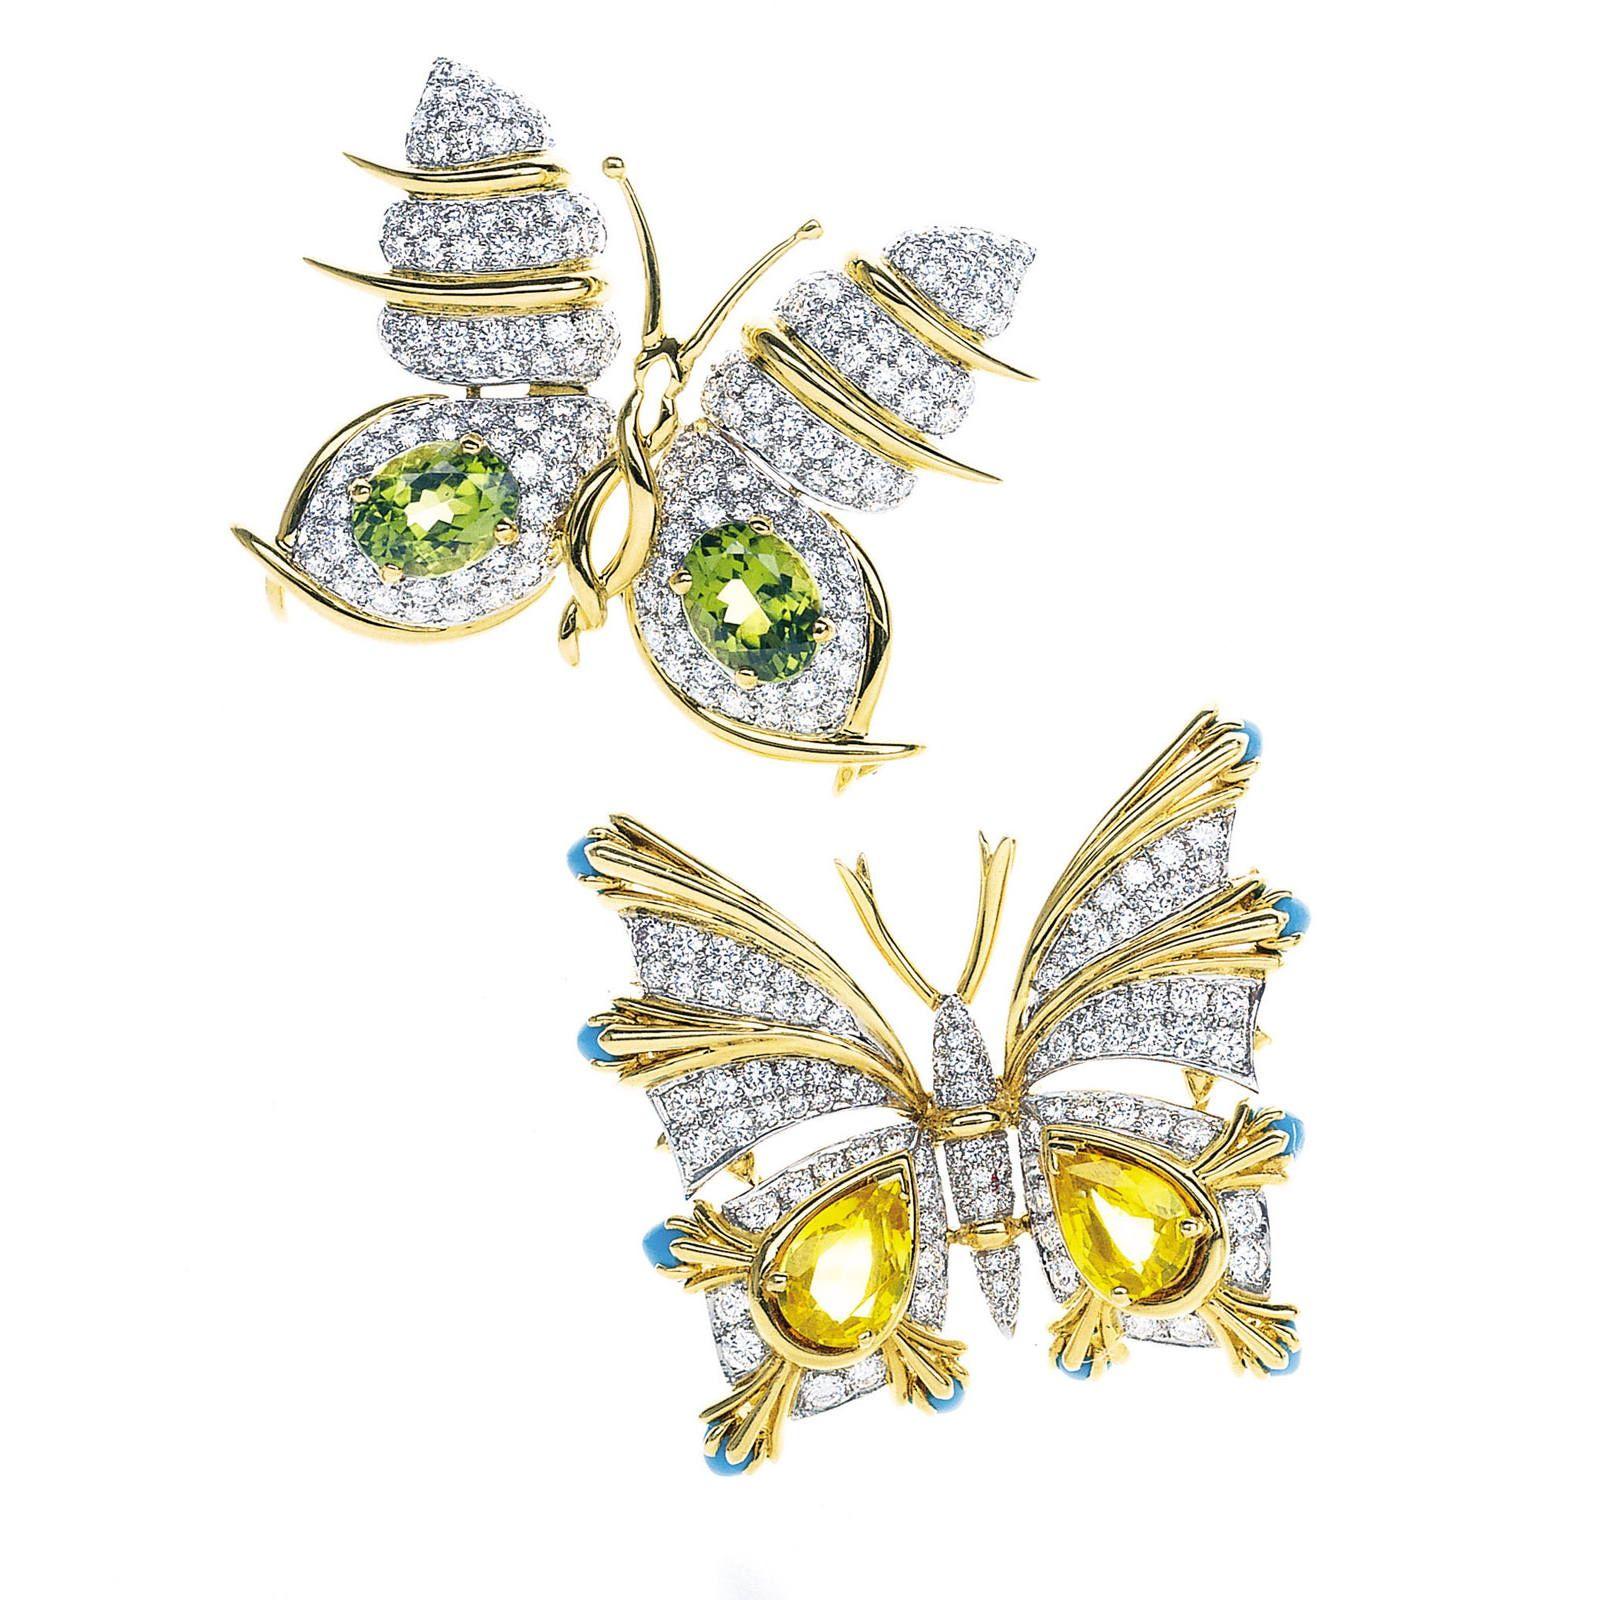 Esma Platinum: Yellow Gold And Platinum Brooches With Diamonds. Designed